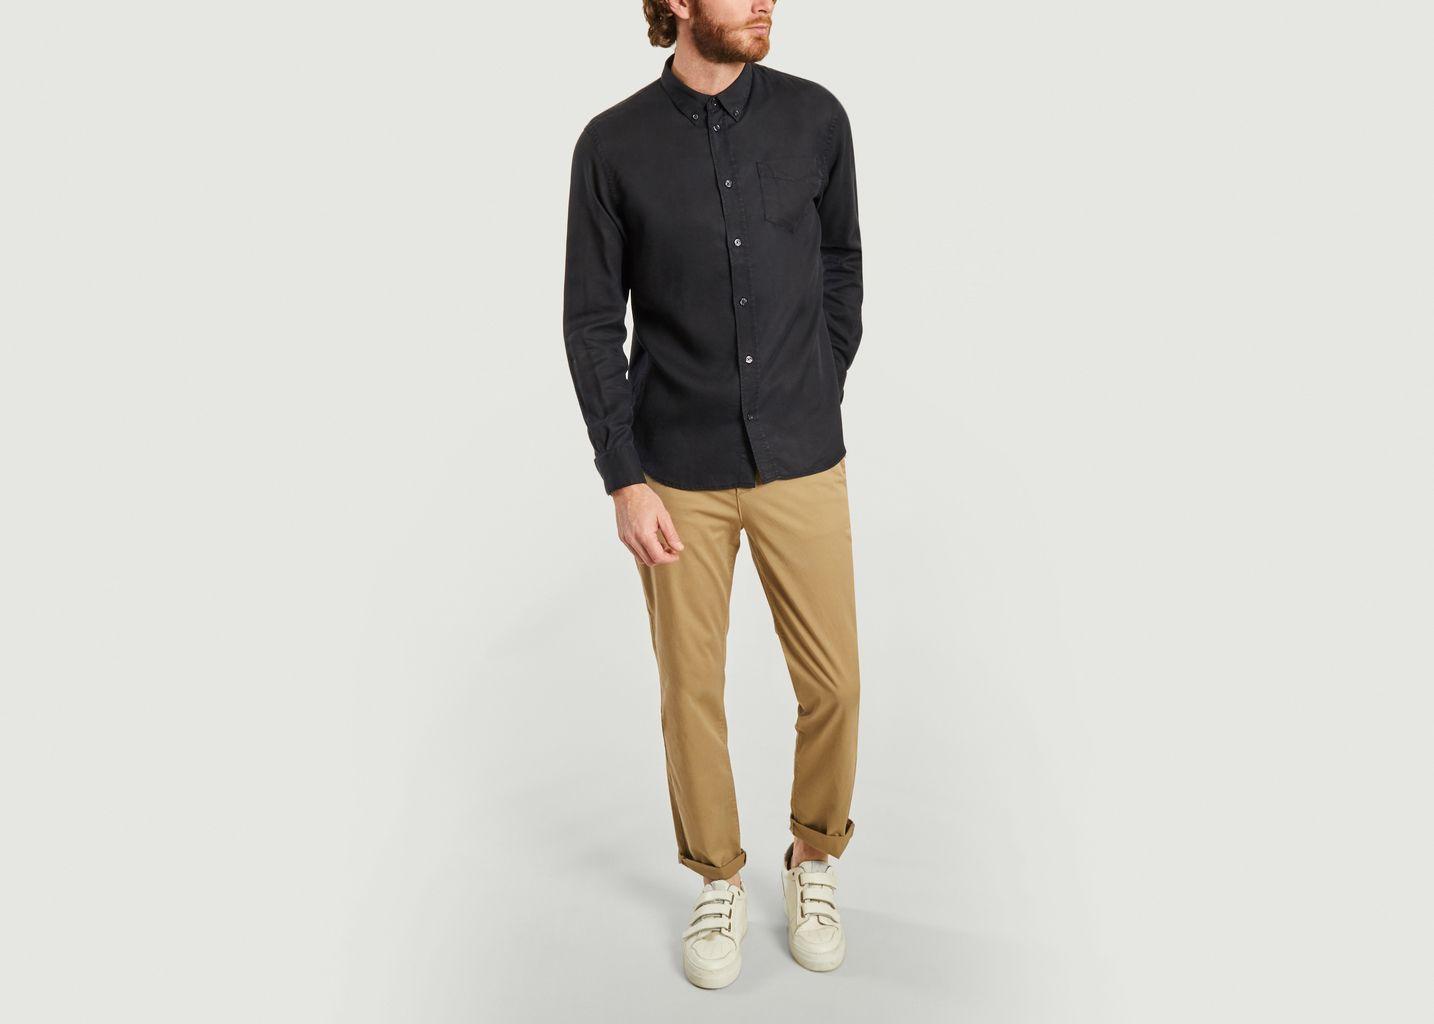 Pantalon Chino Gaston - SUIT